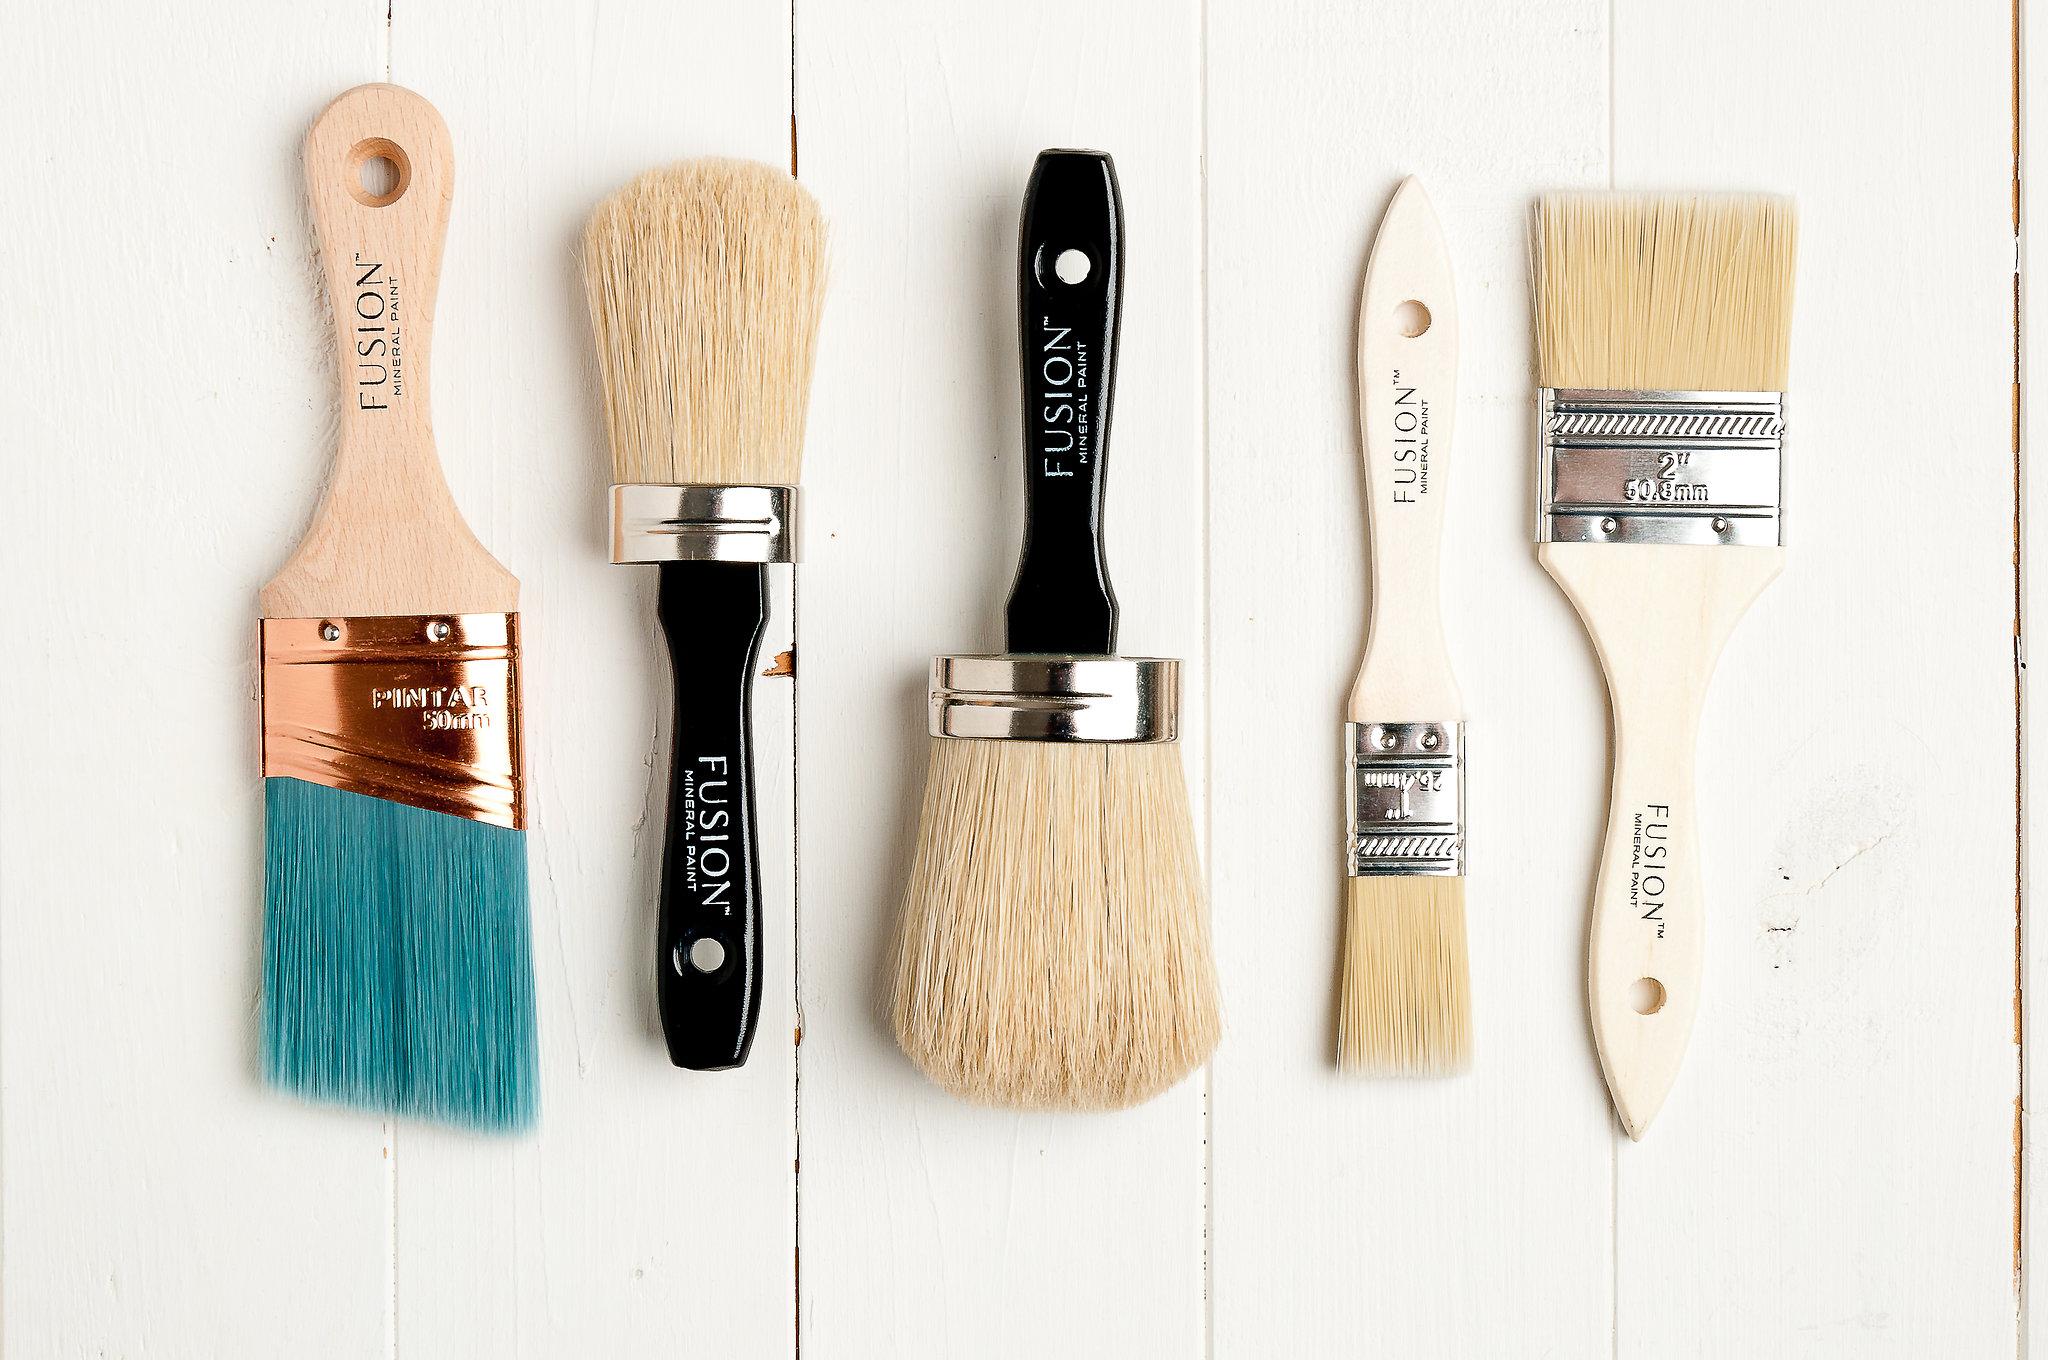 Accessories/brushes